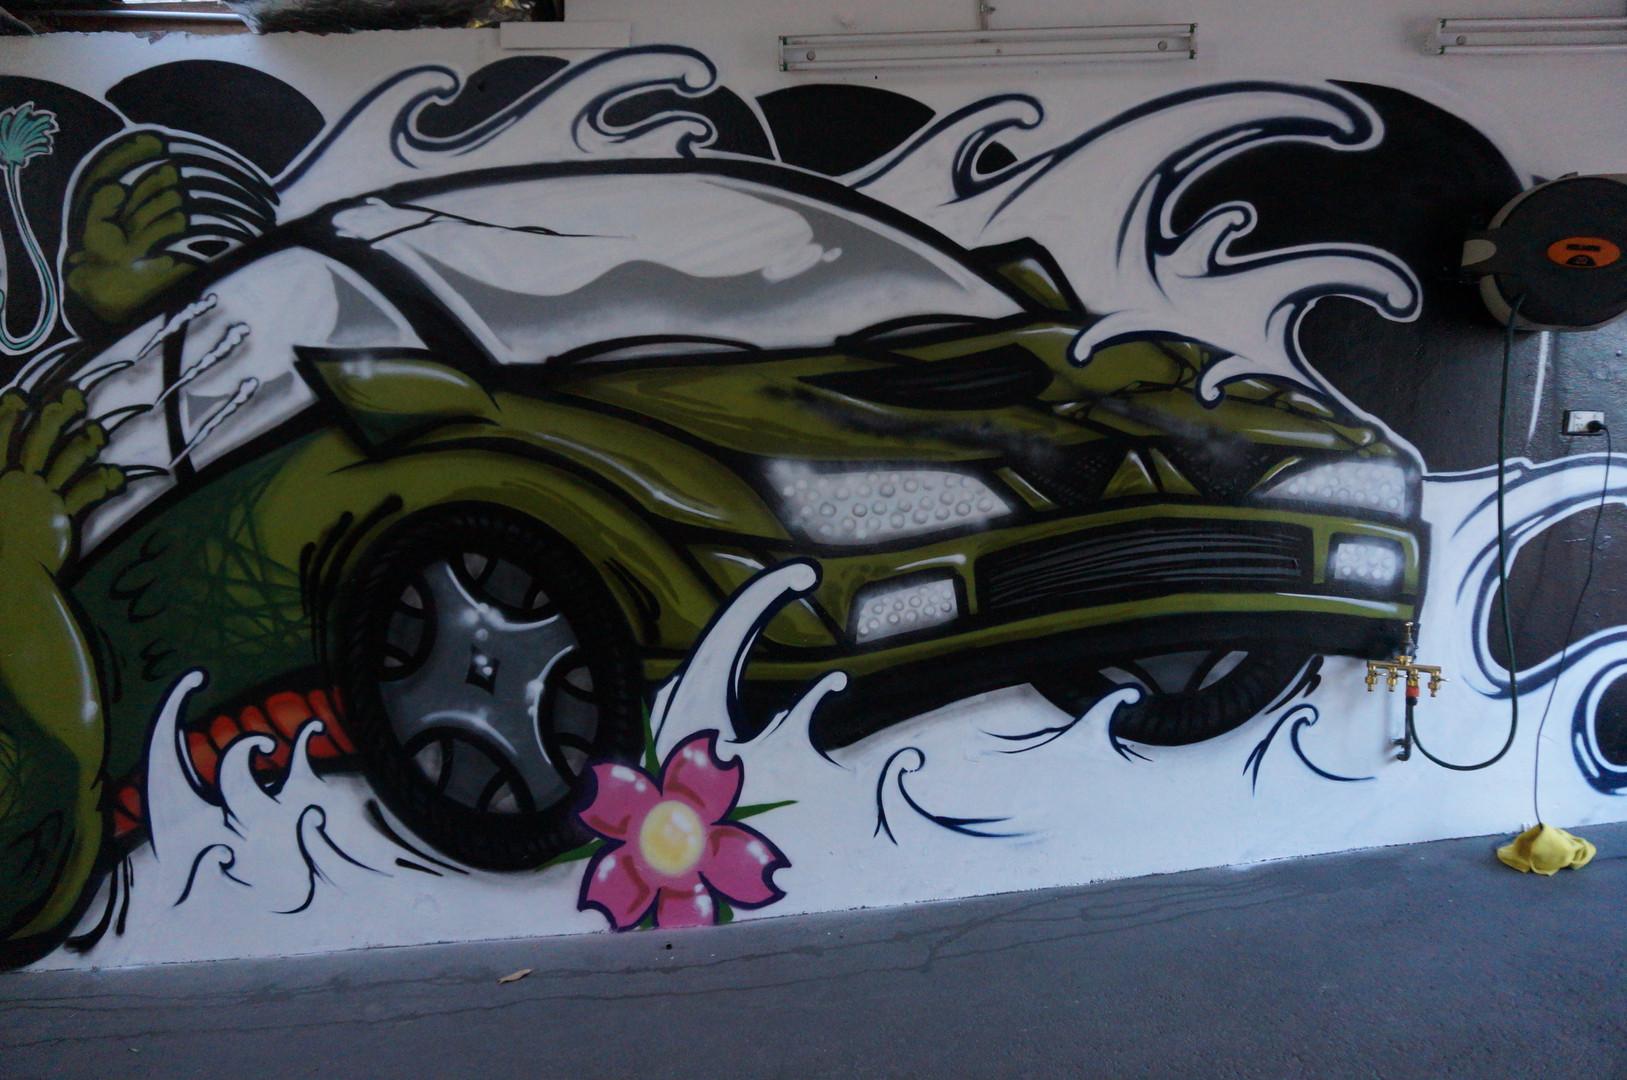 Car Graffiti, Graffiti Artist sydney, Mural, Street Art